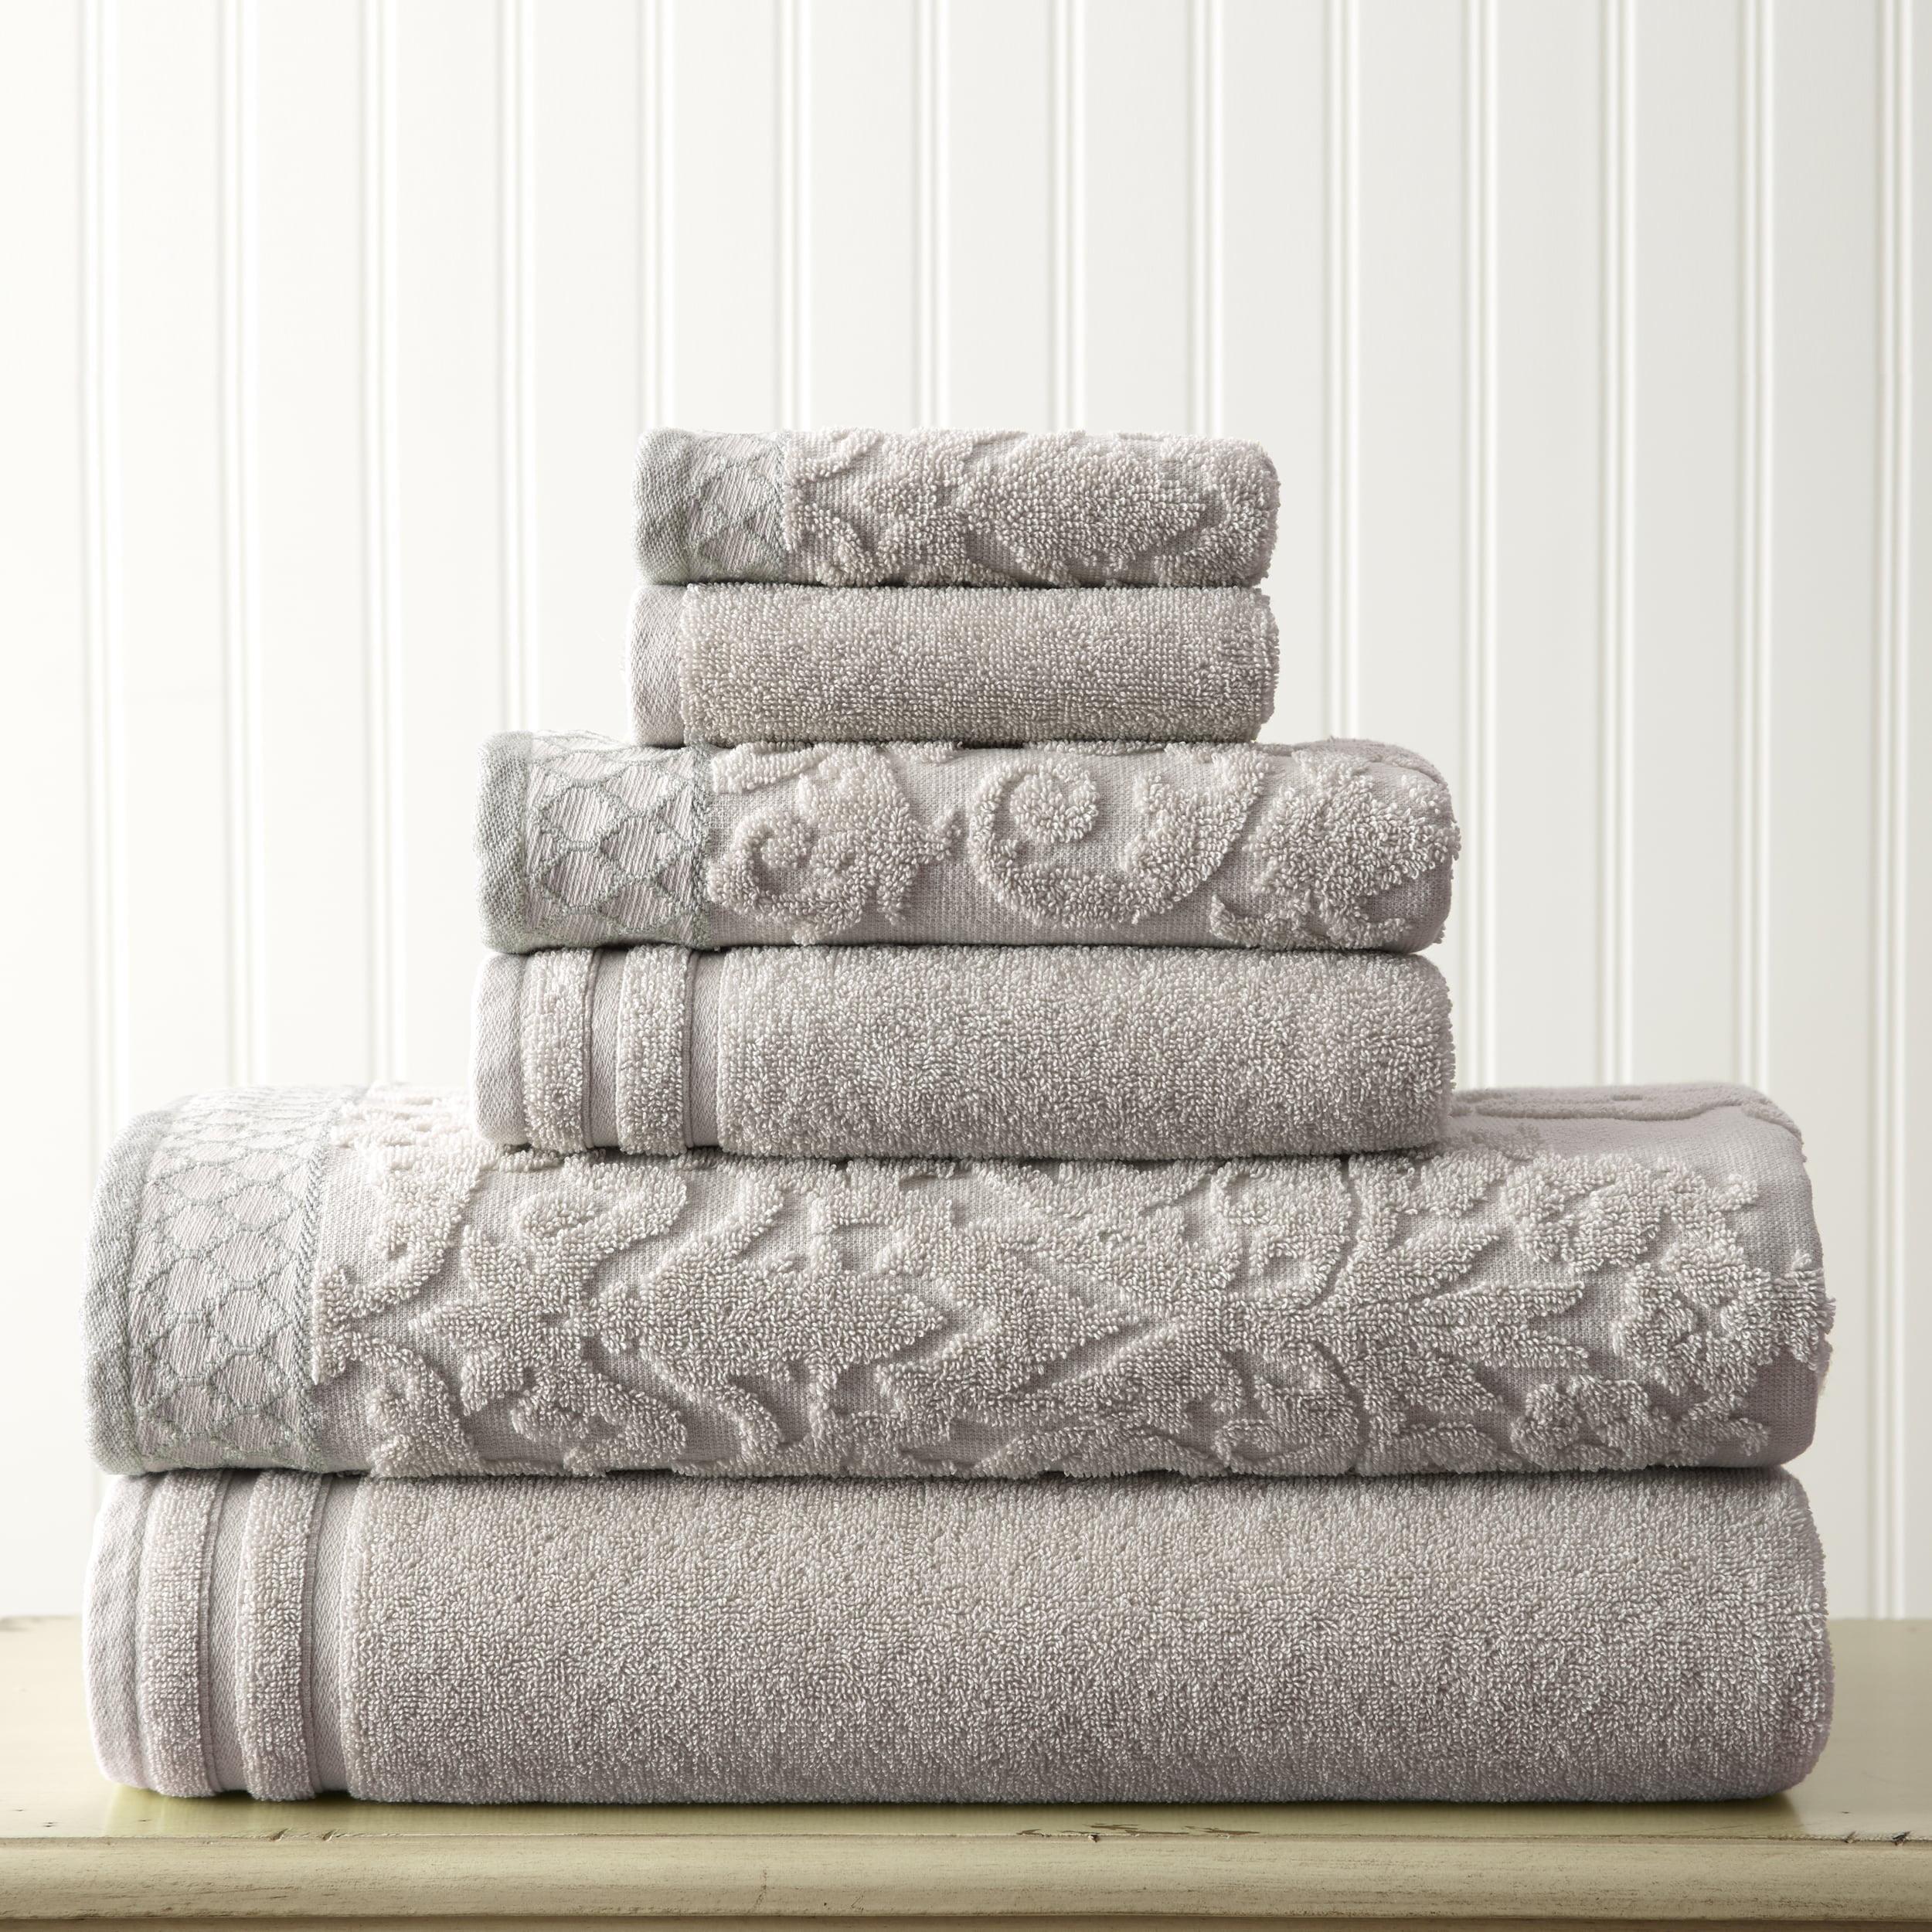 Details about  /Christmas Towels Sets